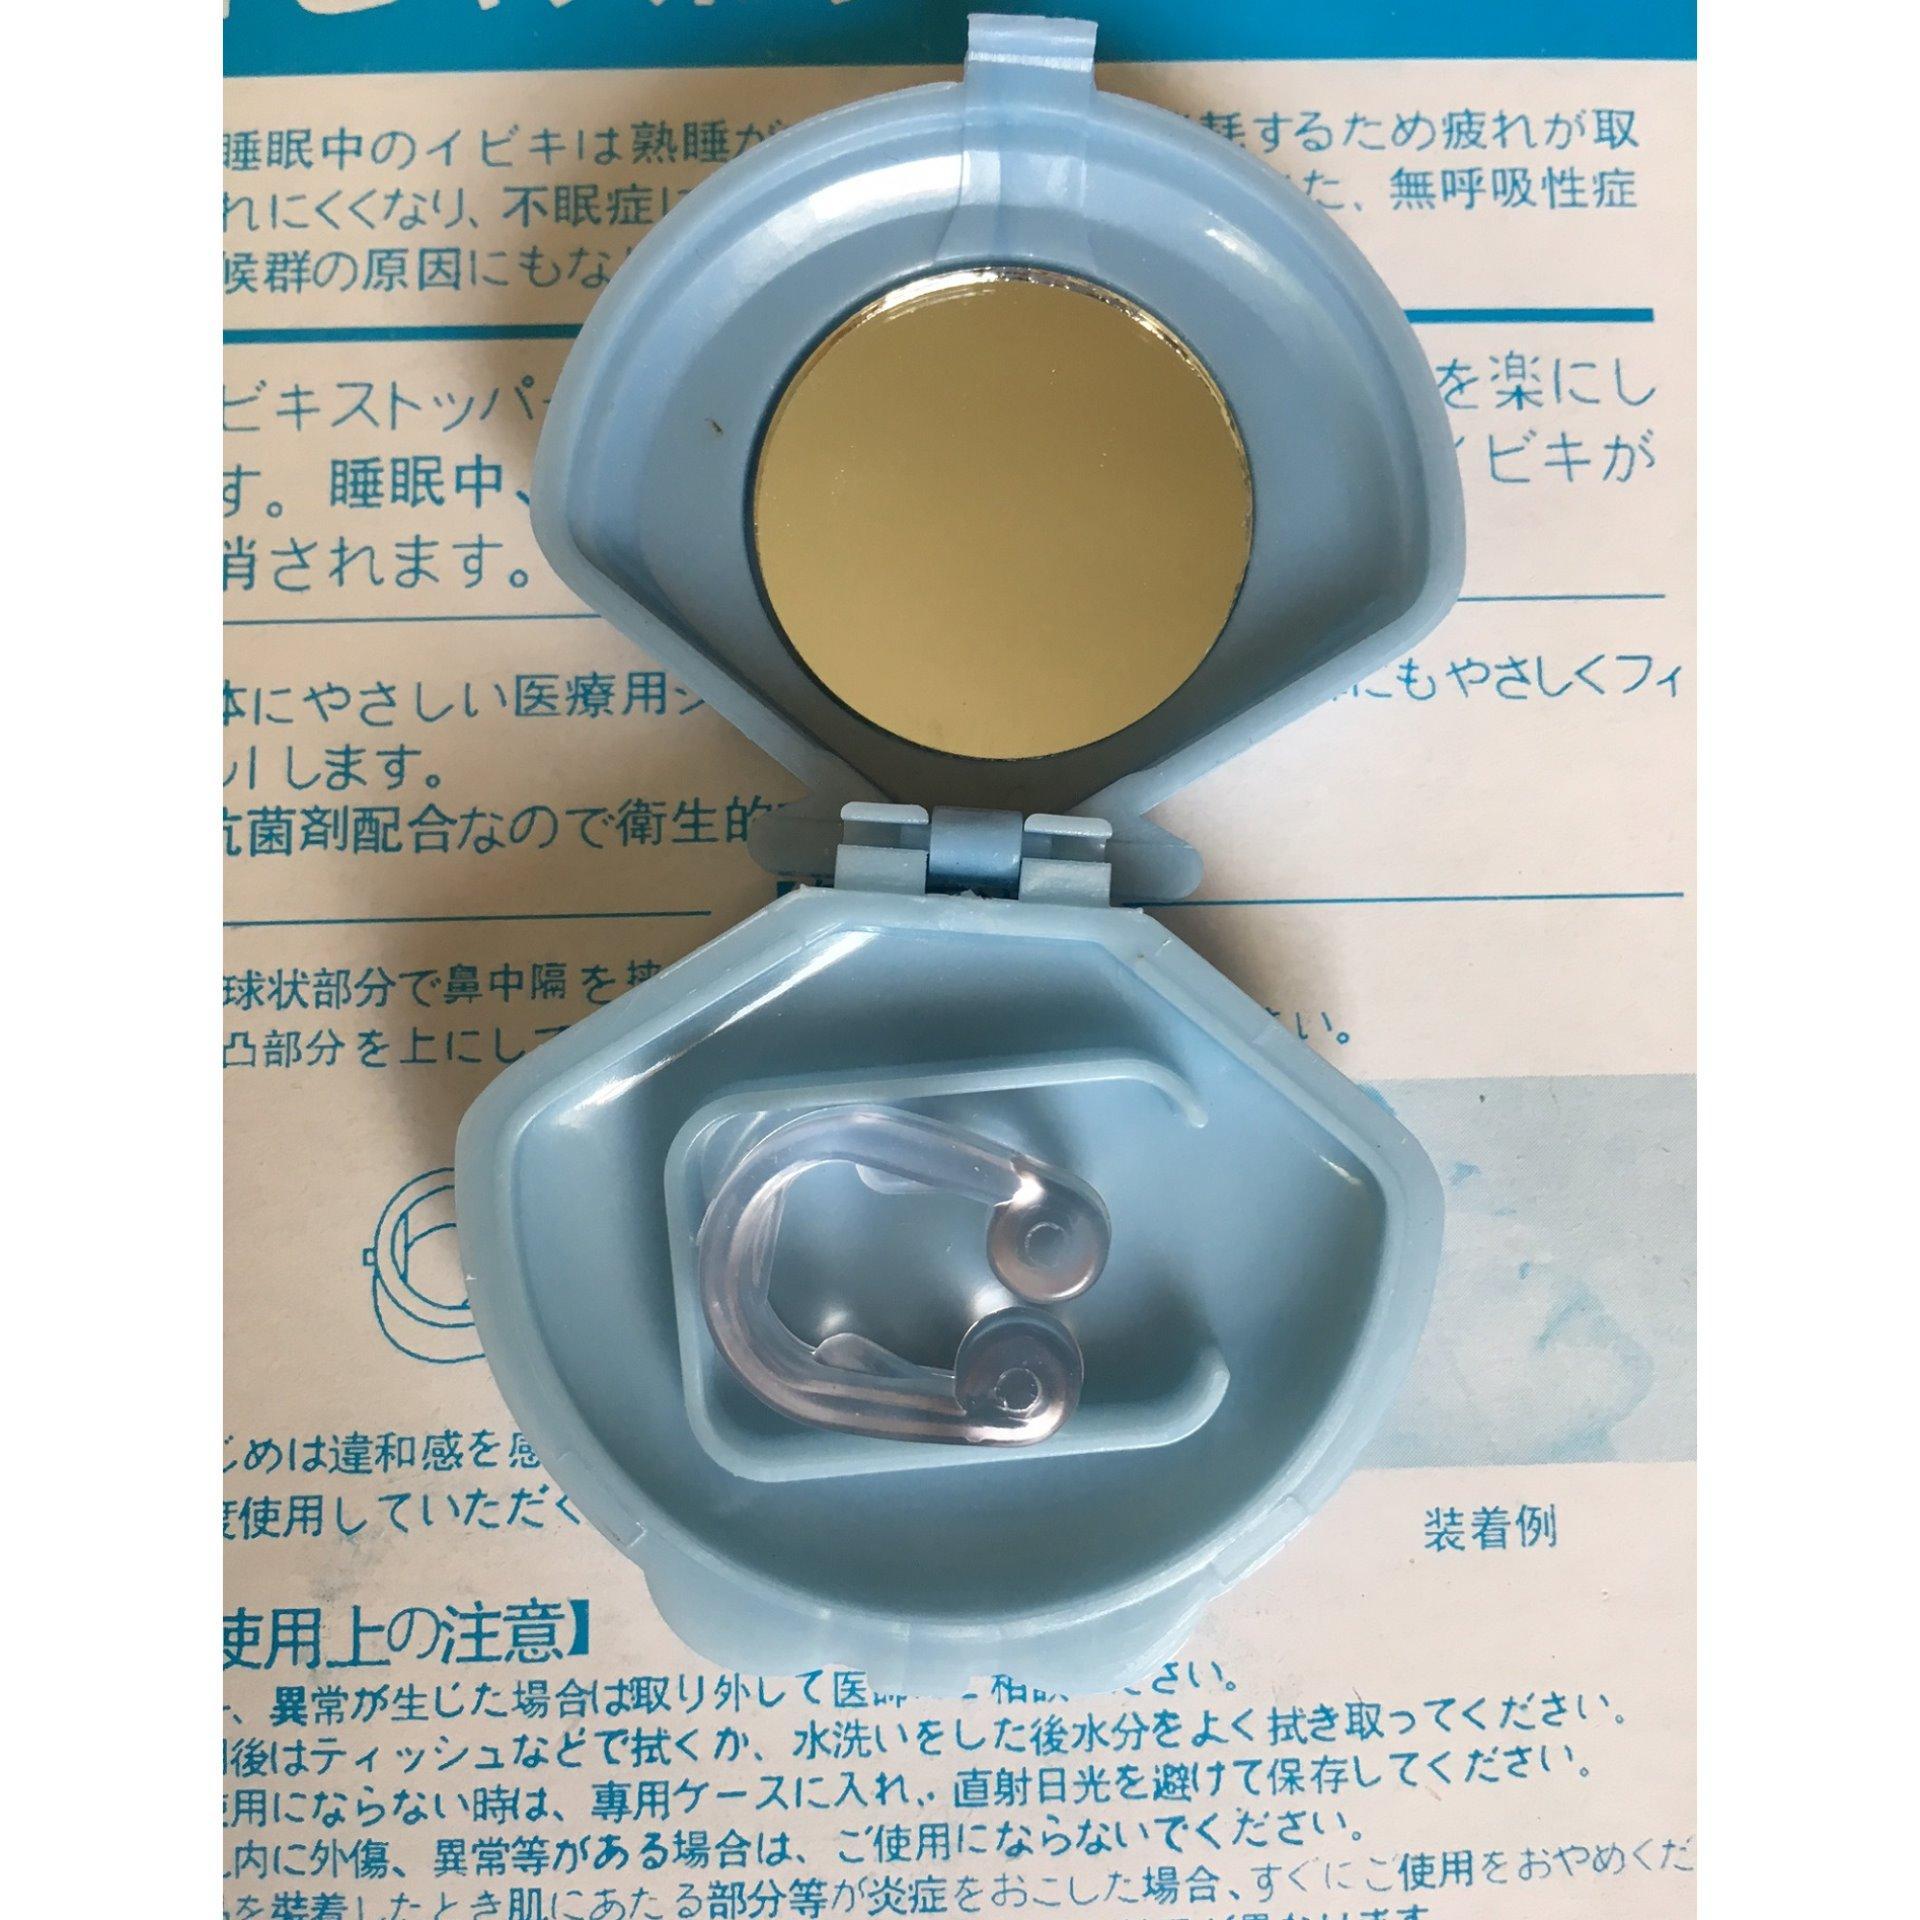 ... Silicon Stop Snoring Nose Clip Anti Snore Sleep Apnea Aid Device ...